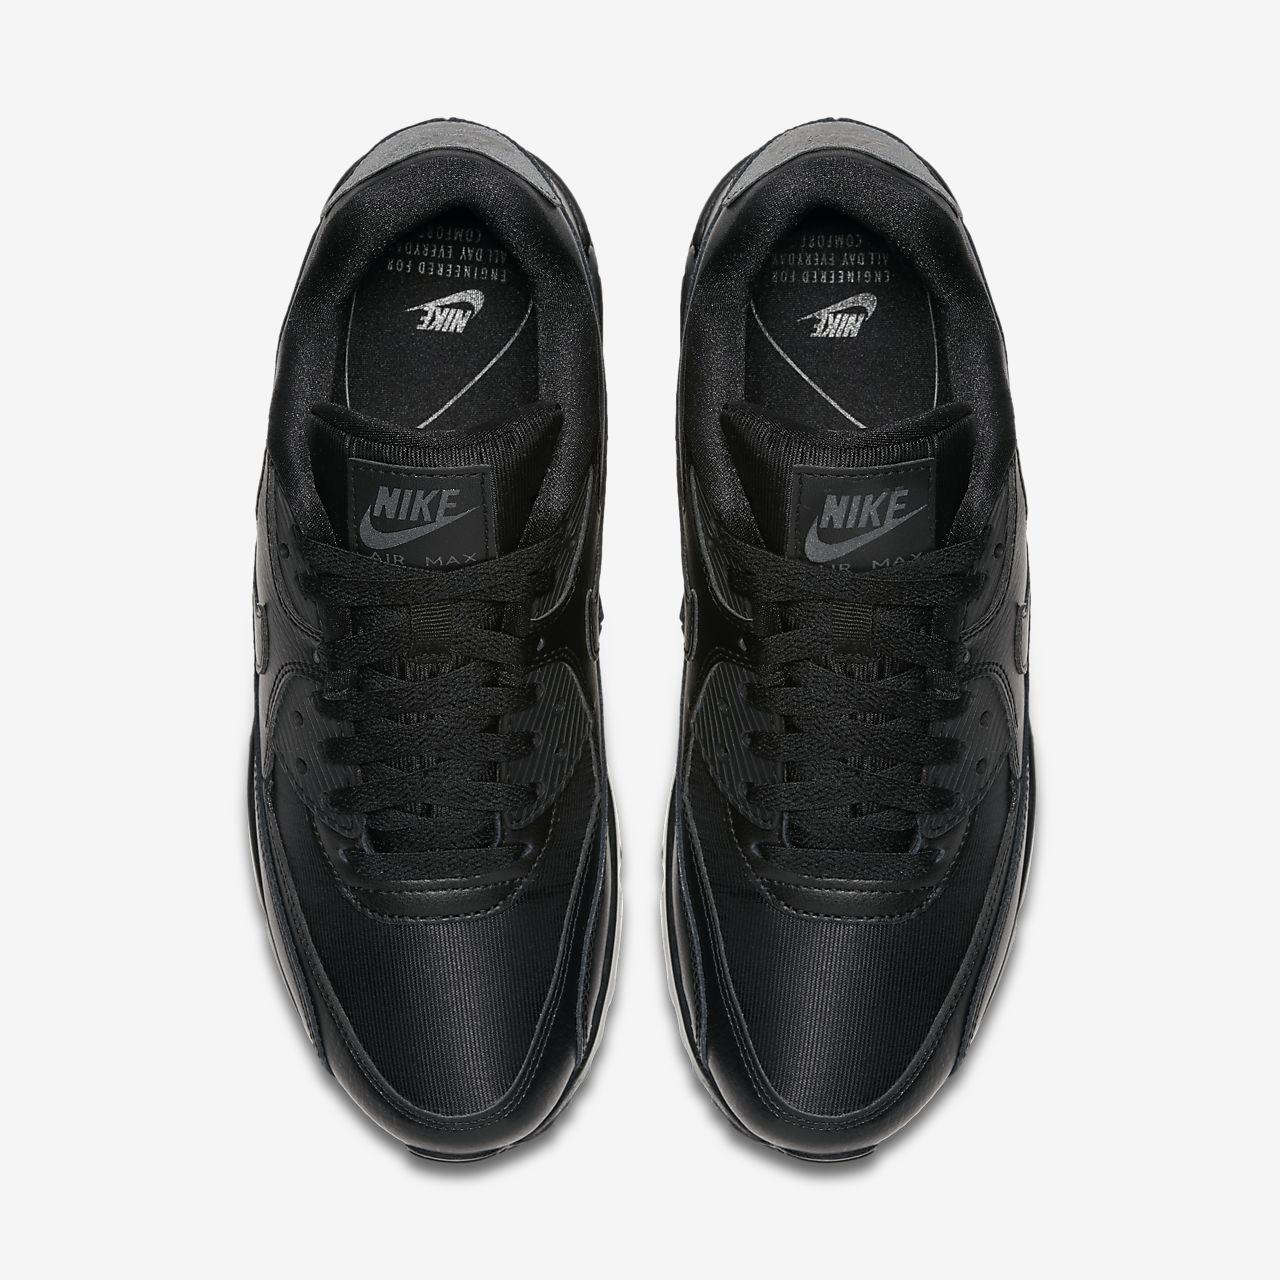 2e59f85d1219 Nike Air Max 90 Women s Shoe. Nike.com GB